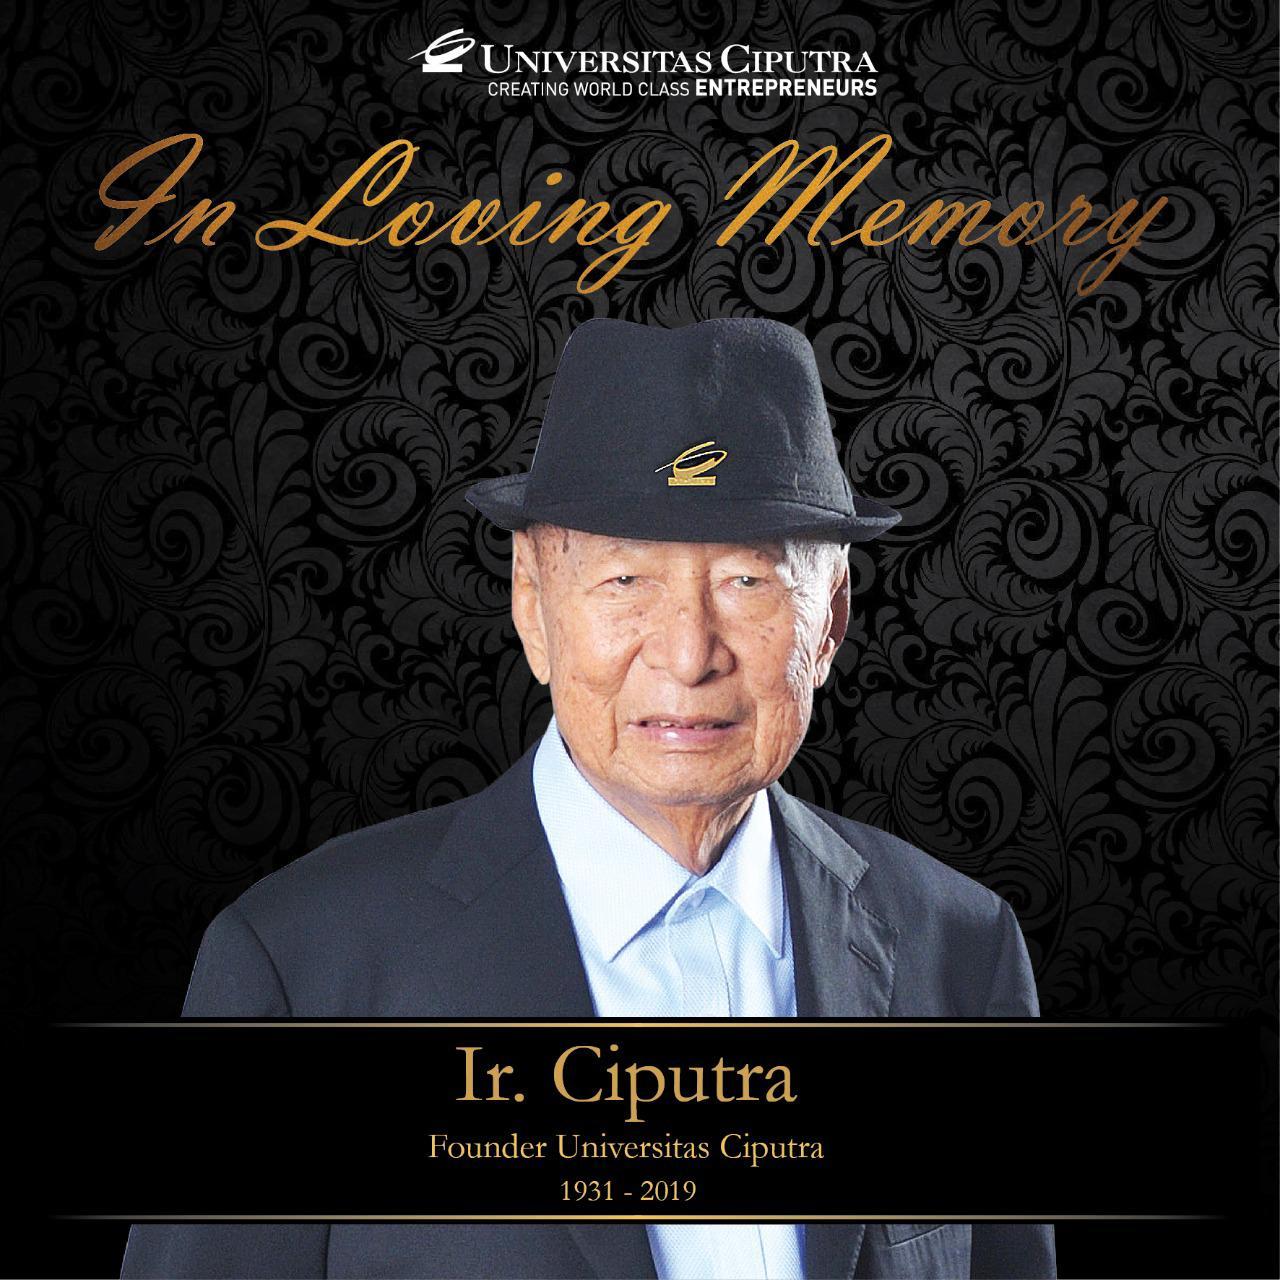 Ir. Ciputra - in Loving Memory